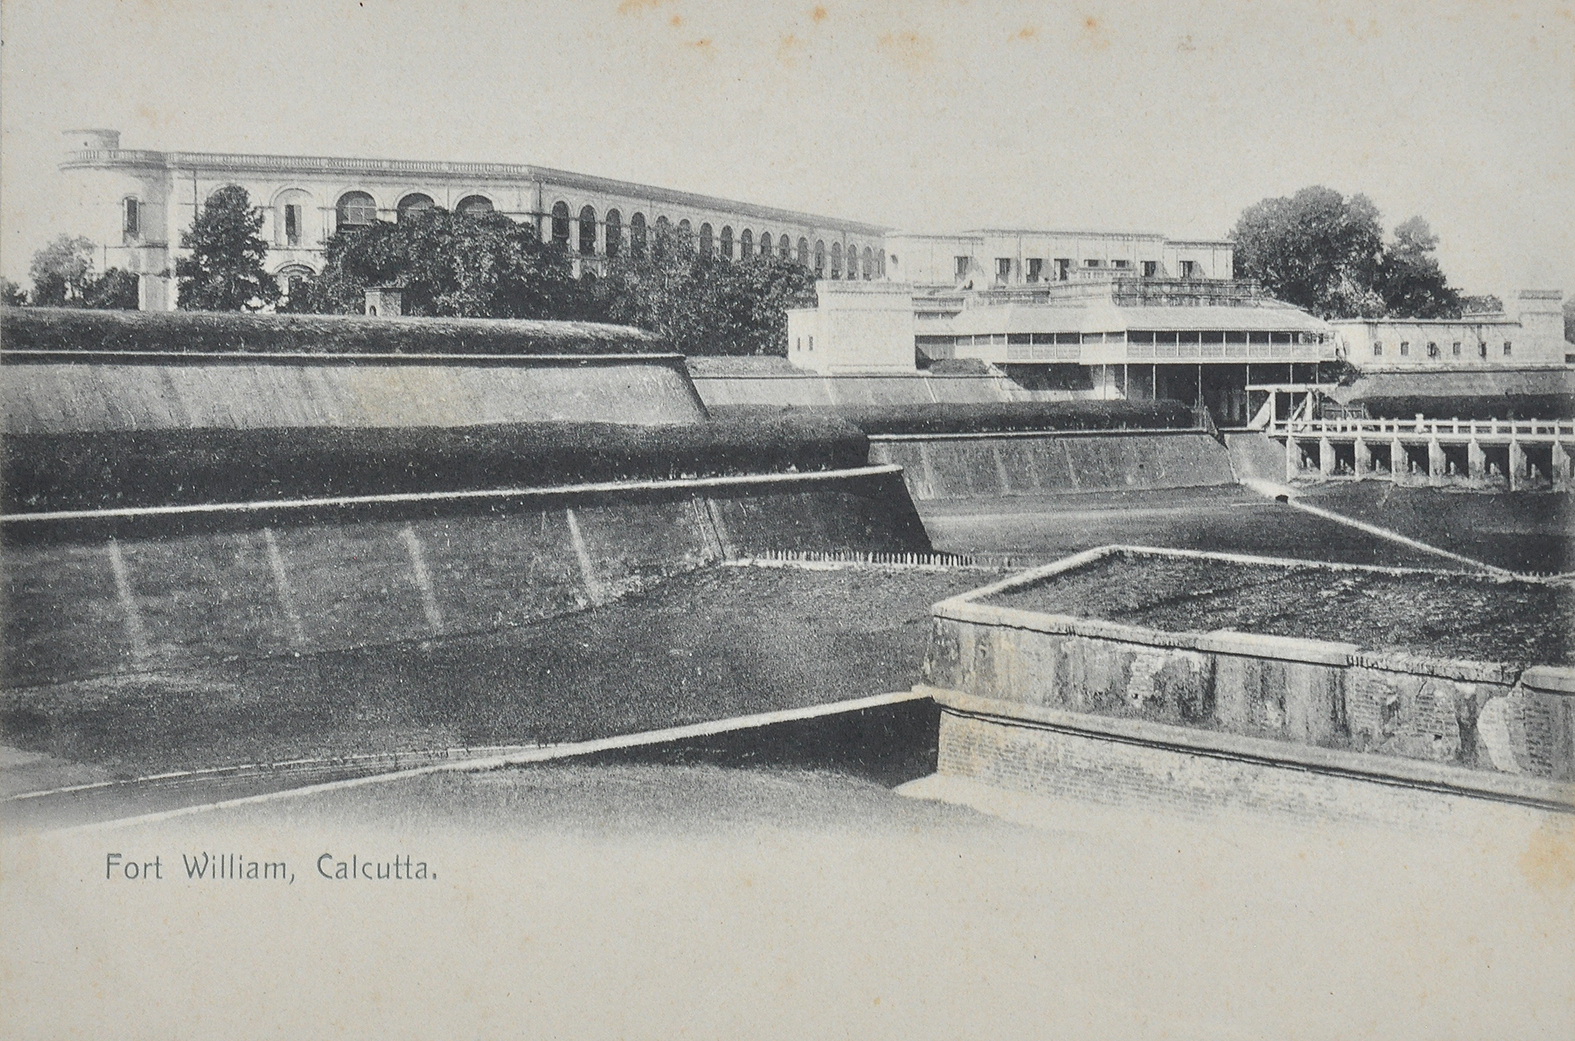 Fort William Calcutta - Old Postcard 1900